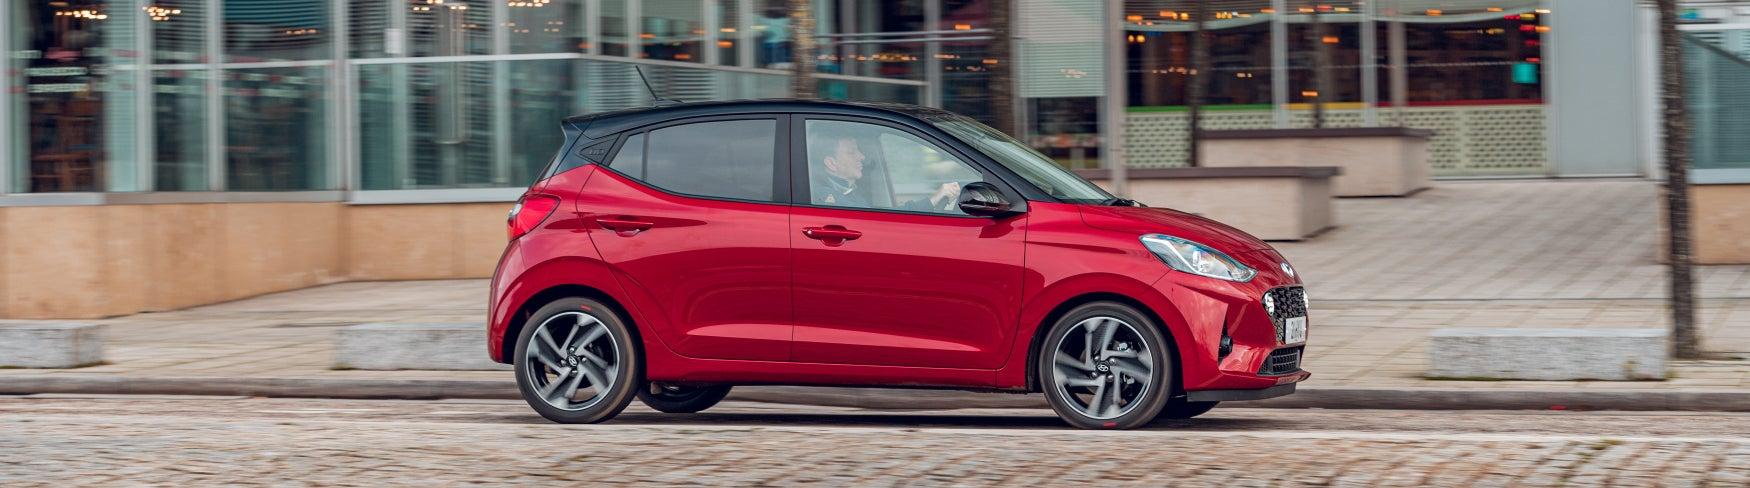 Best City Cars 2021